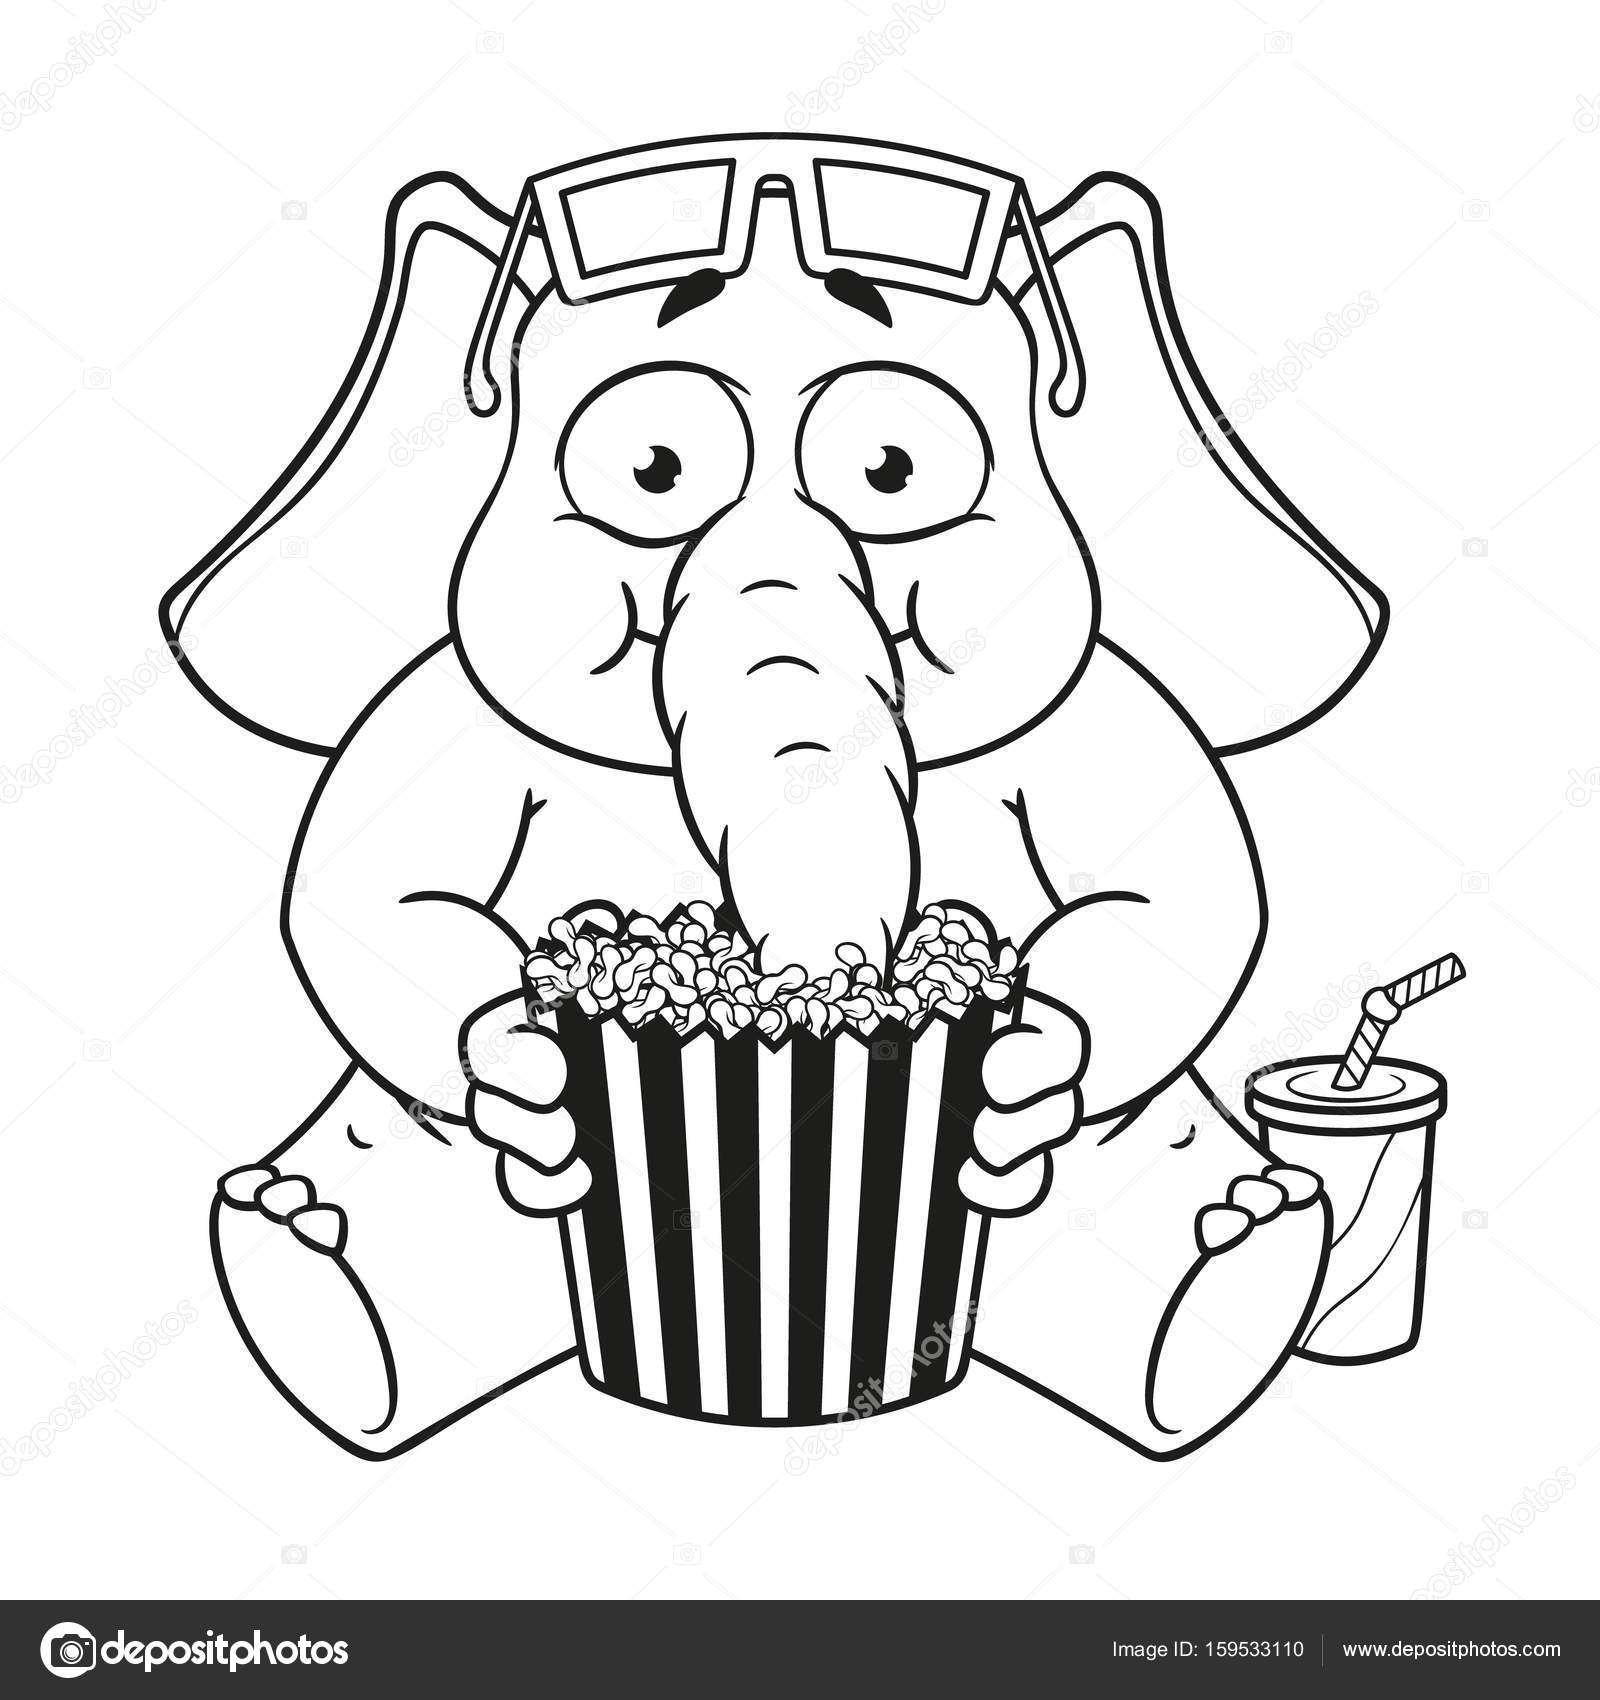 1600x1700 Big Collection Vector Cartoon Characters Of Elephants On